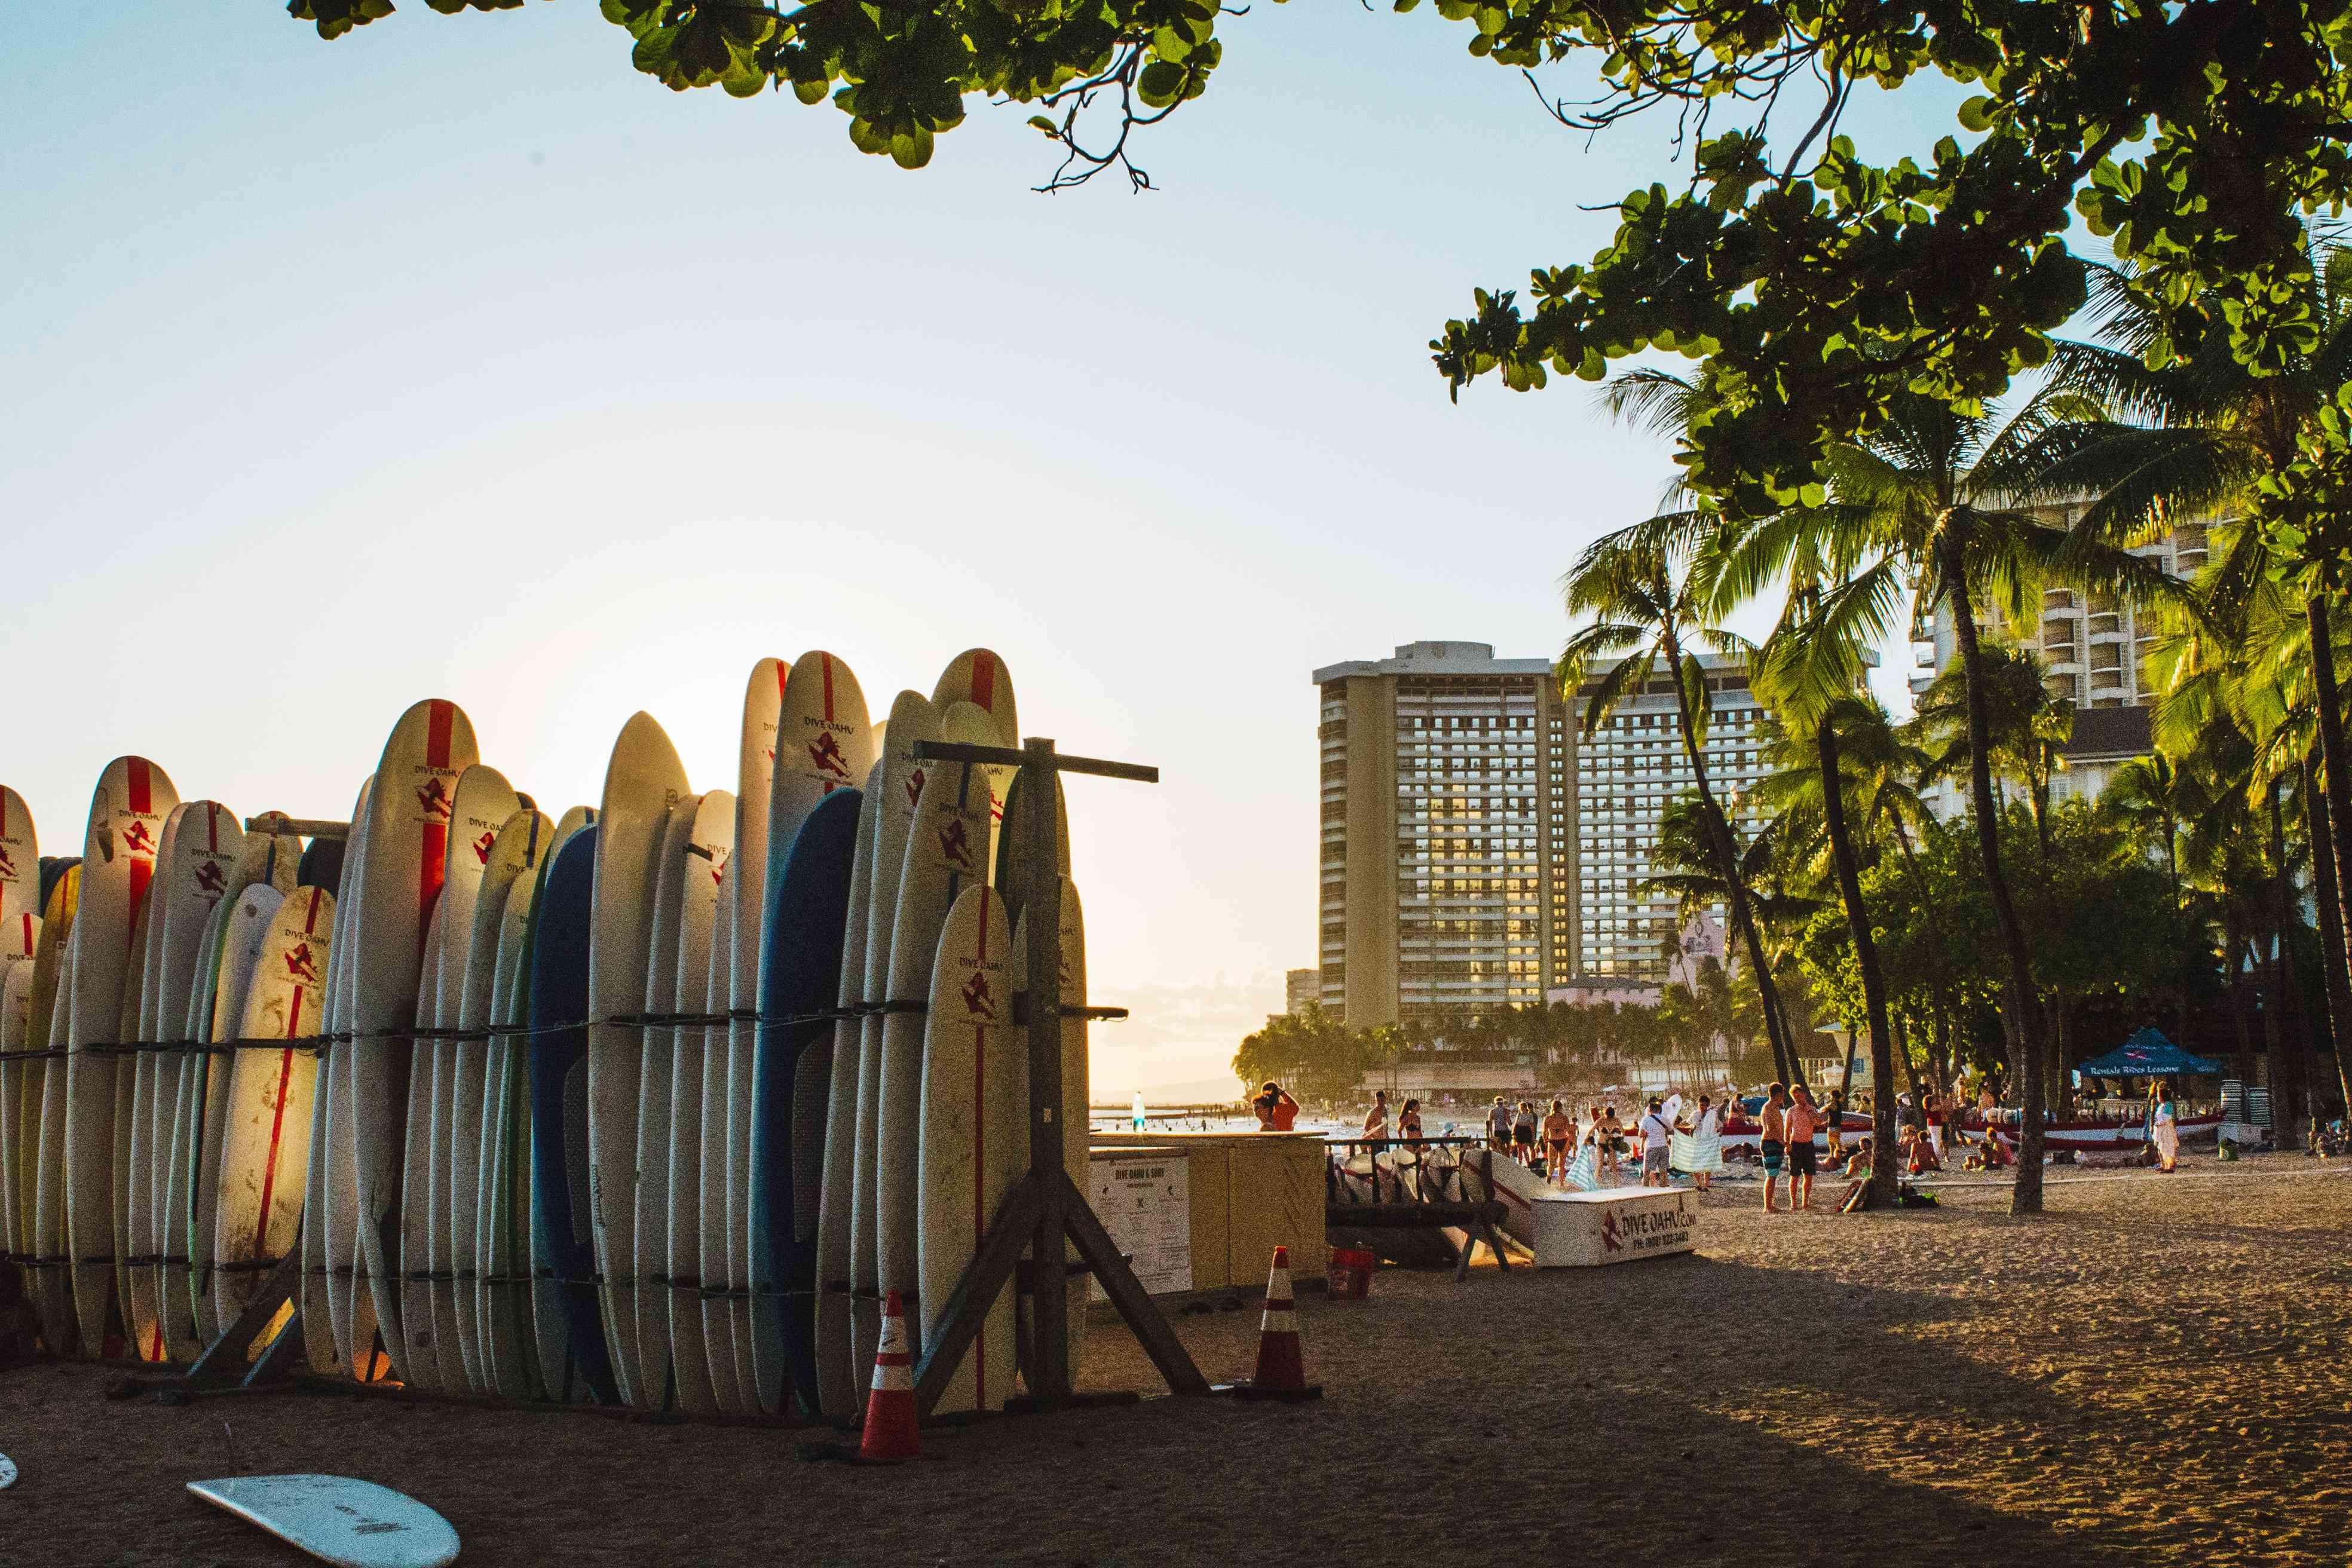 Tablas de surf apiladas en Waikiki Beach